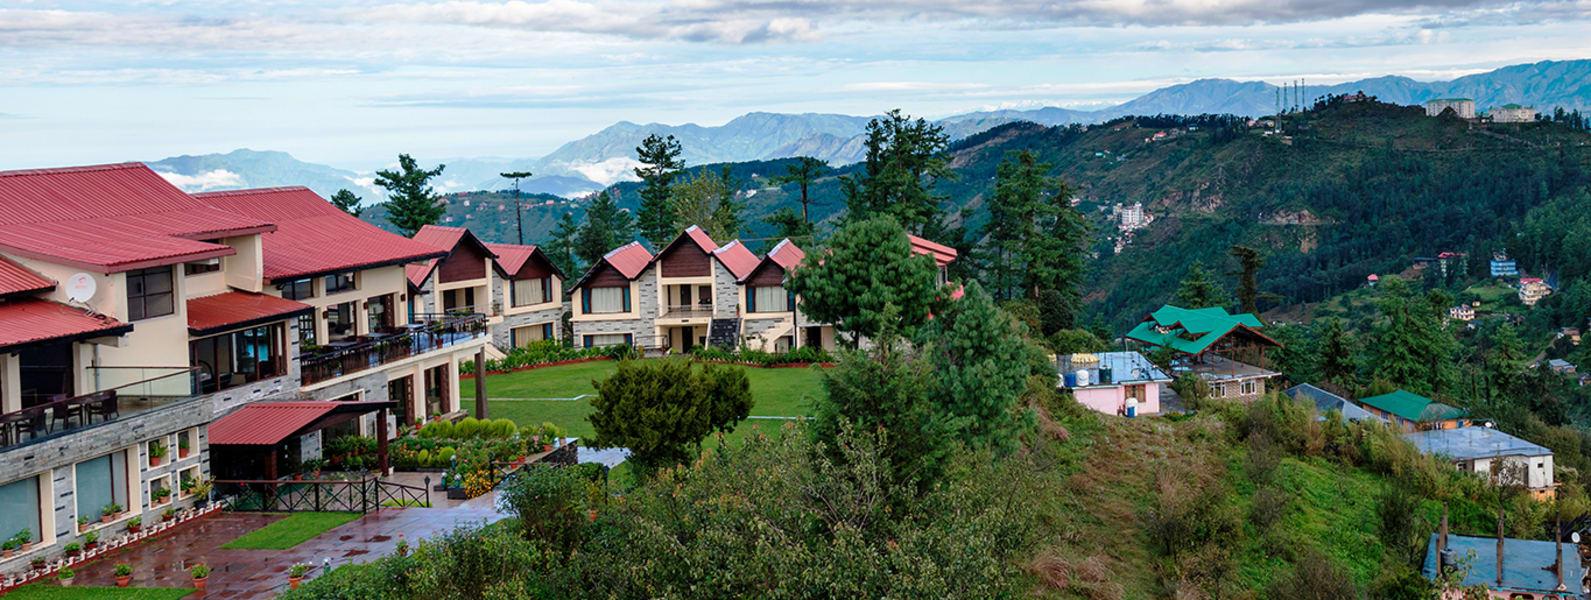 Koti Resort, Shimla Image